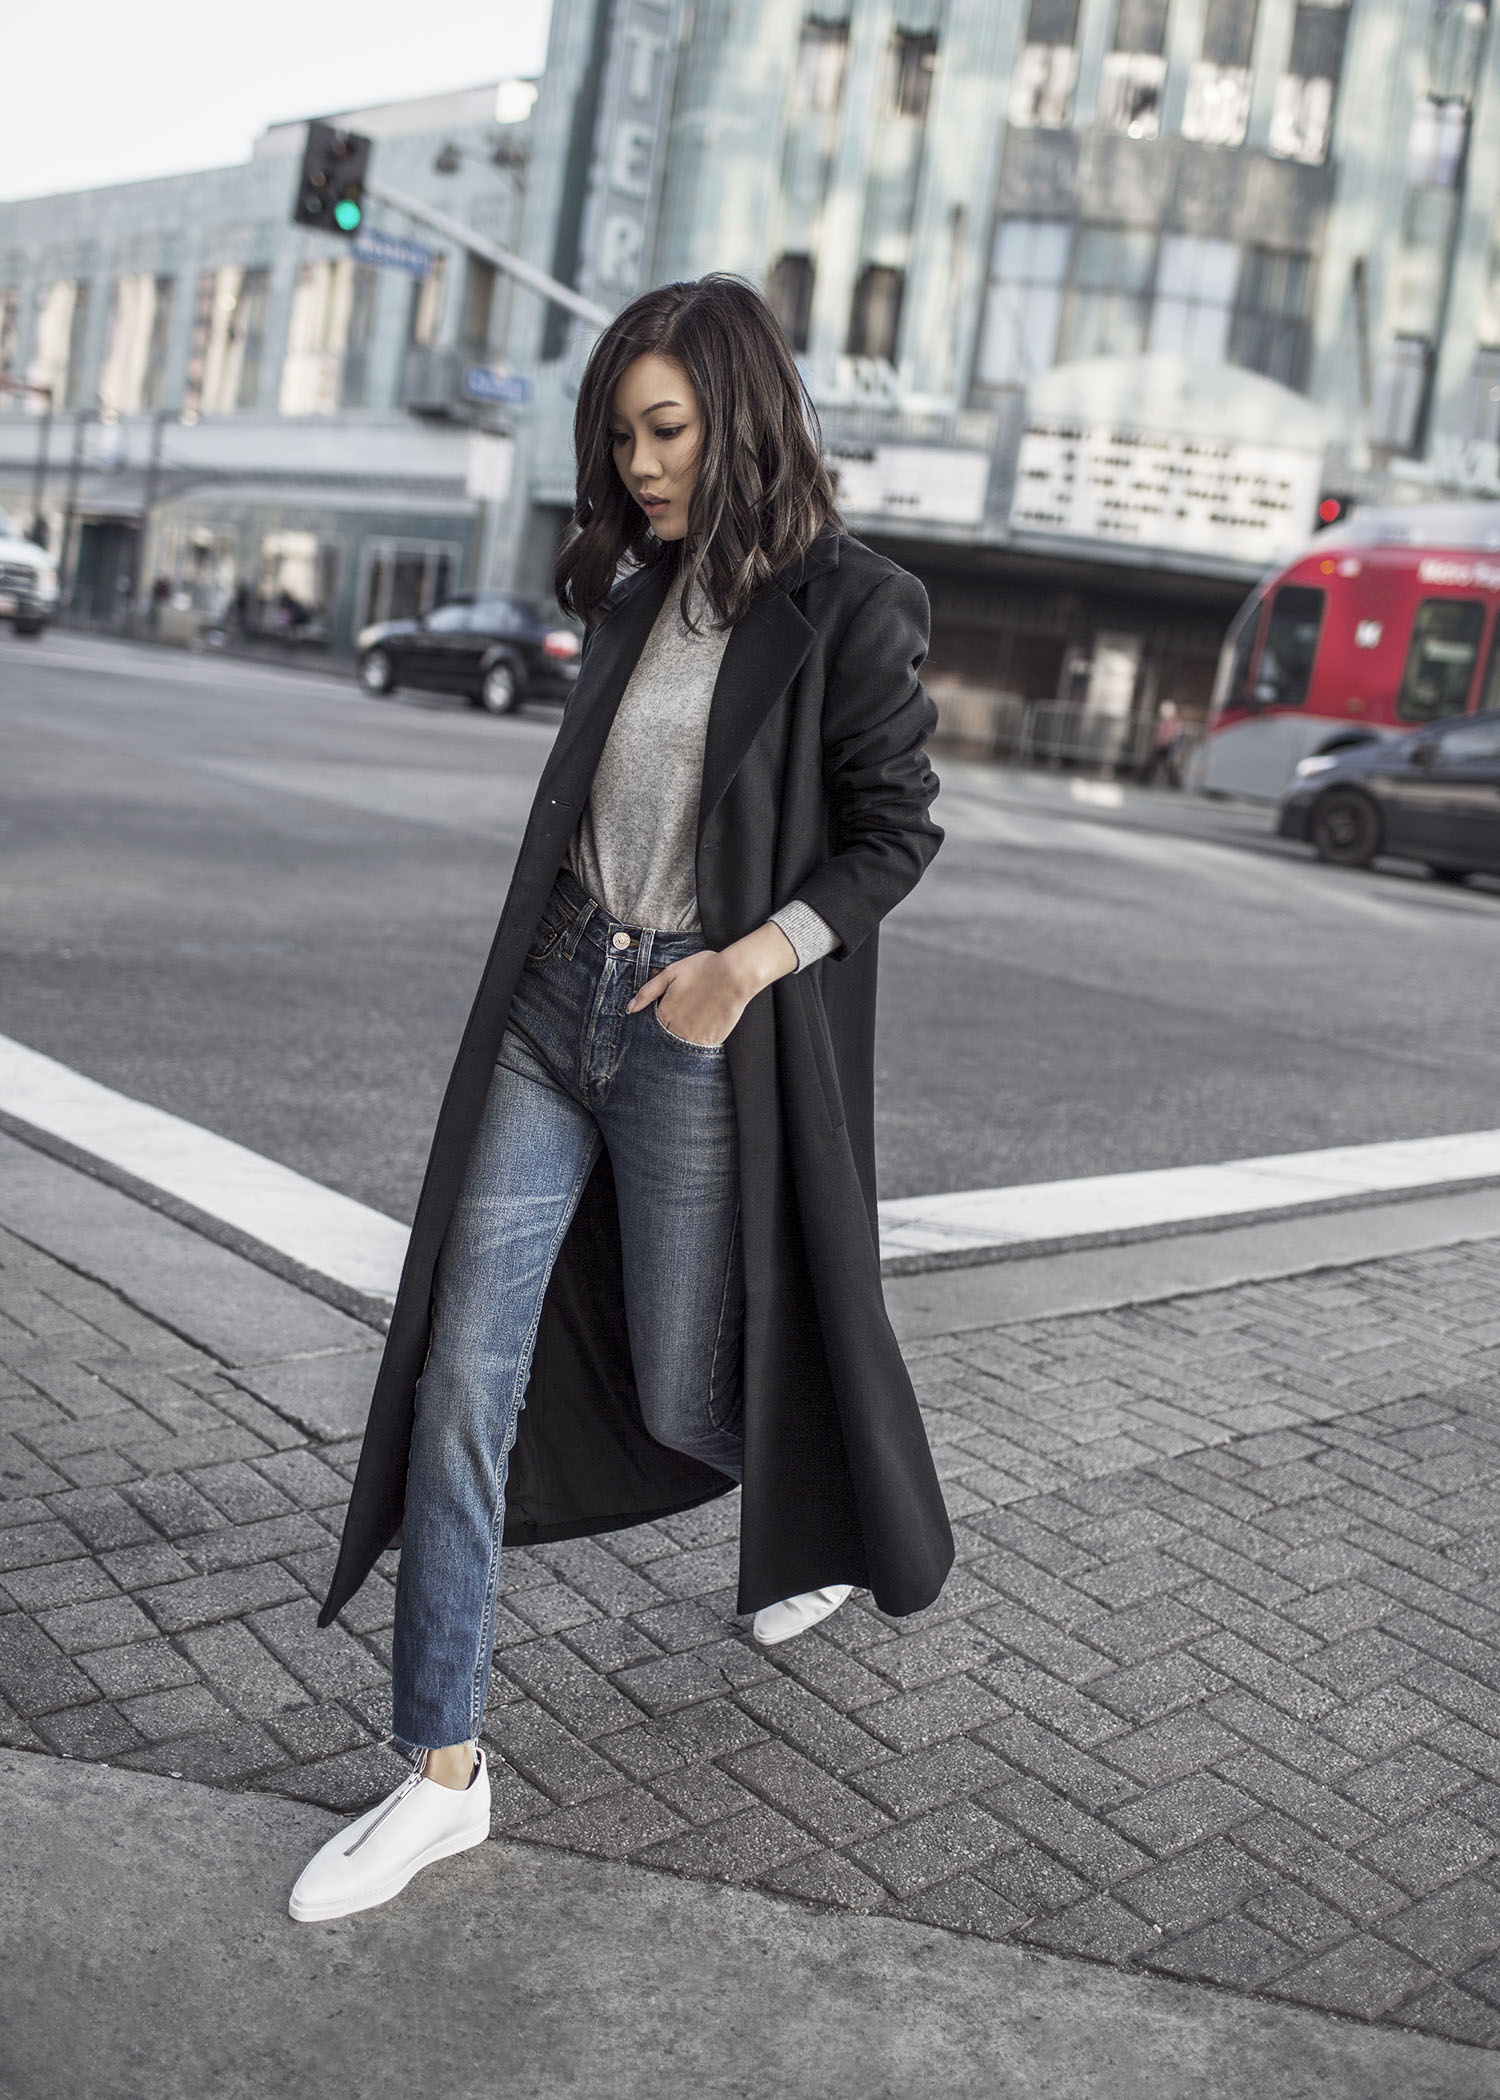 Jenny Tsang of Tsangtastic styling different ways to wear long coats